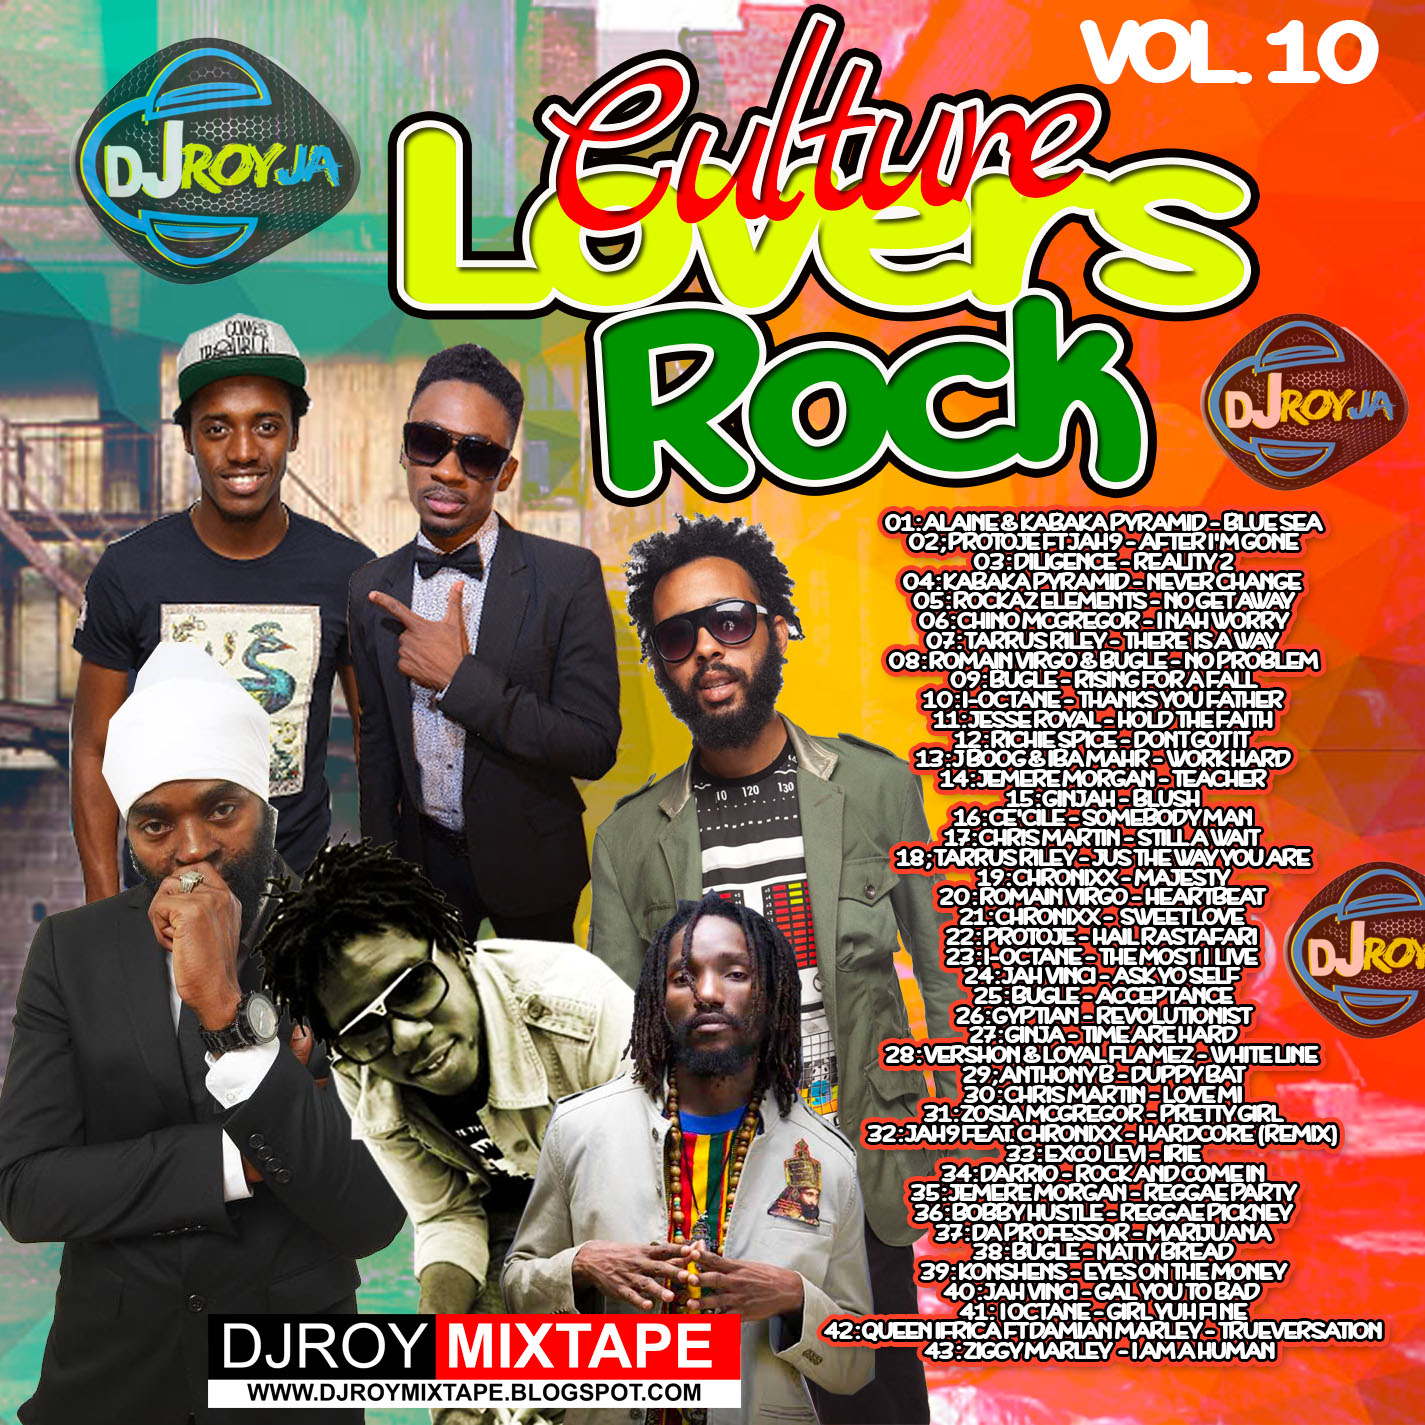 DJROYMIXTAPE : DJ ROY CULTURE LOVERS ROCK MIX VOL 10